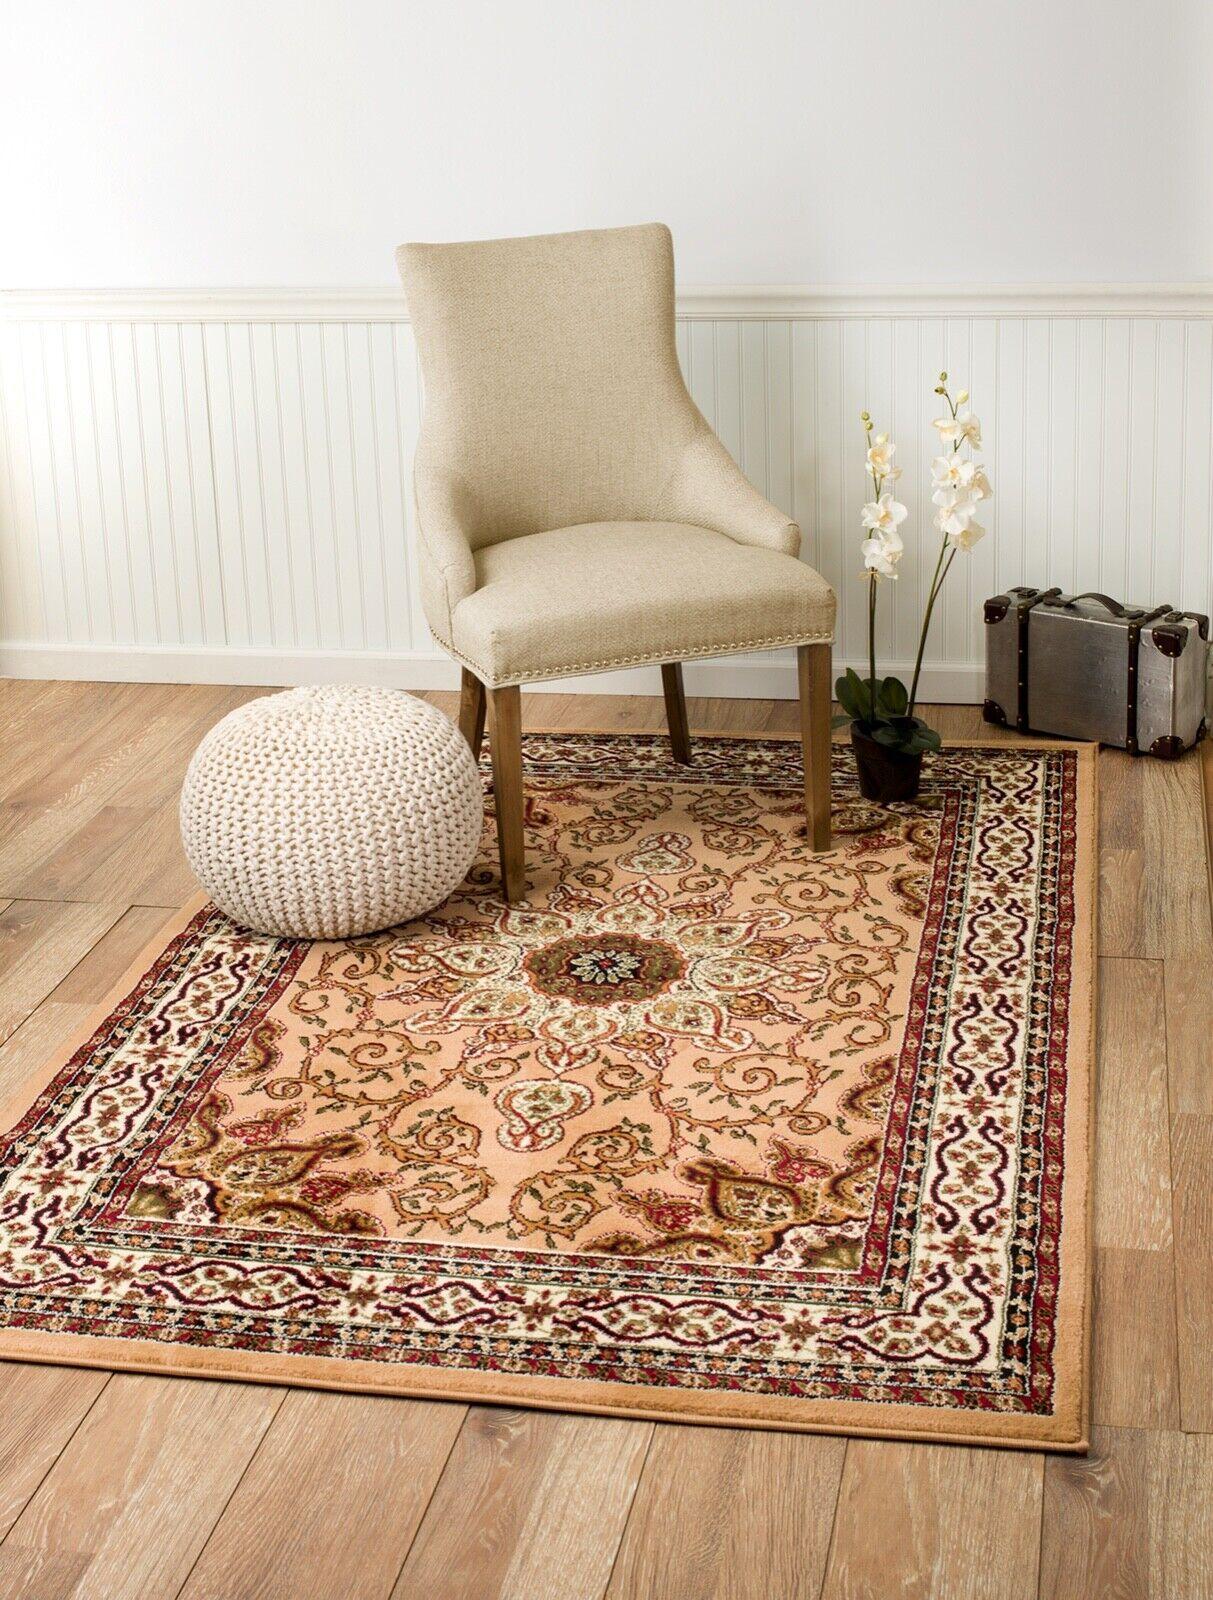 Area rug Smt#08 traditional beige and brown design soft pile